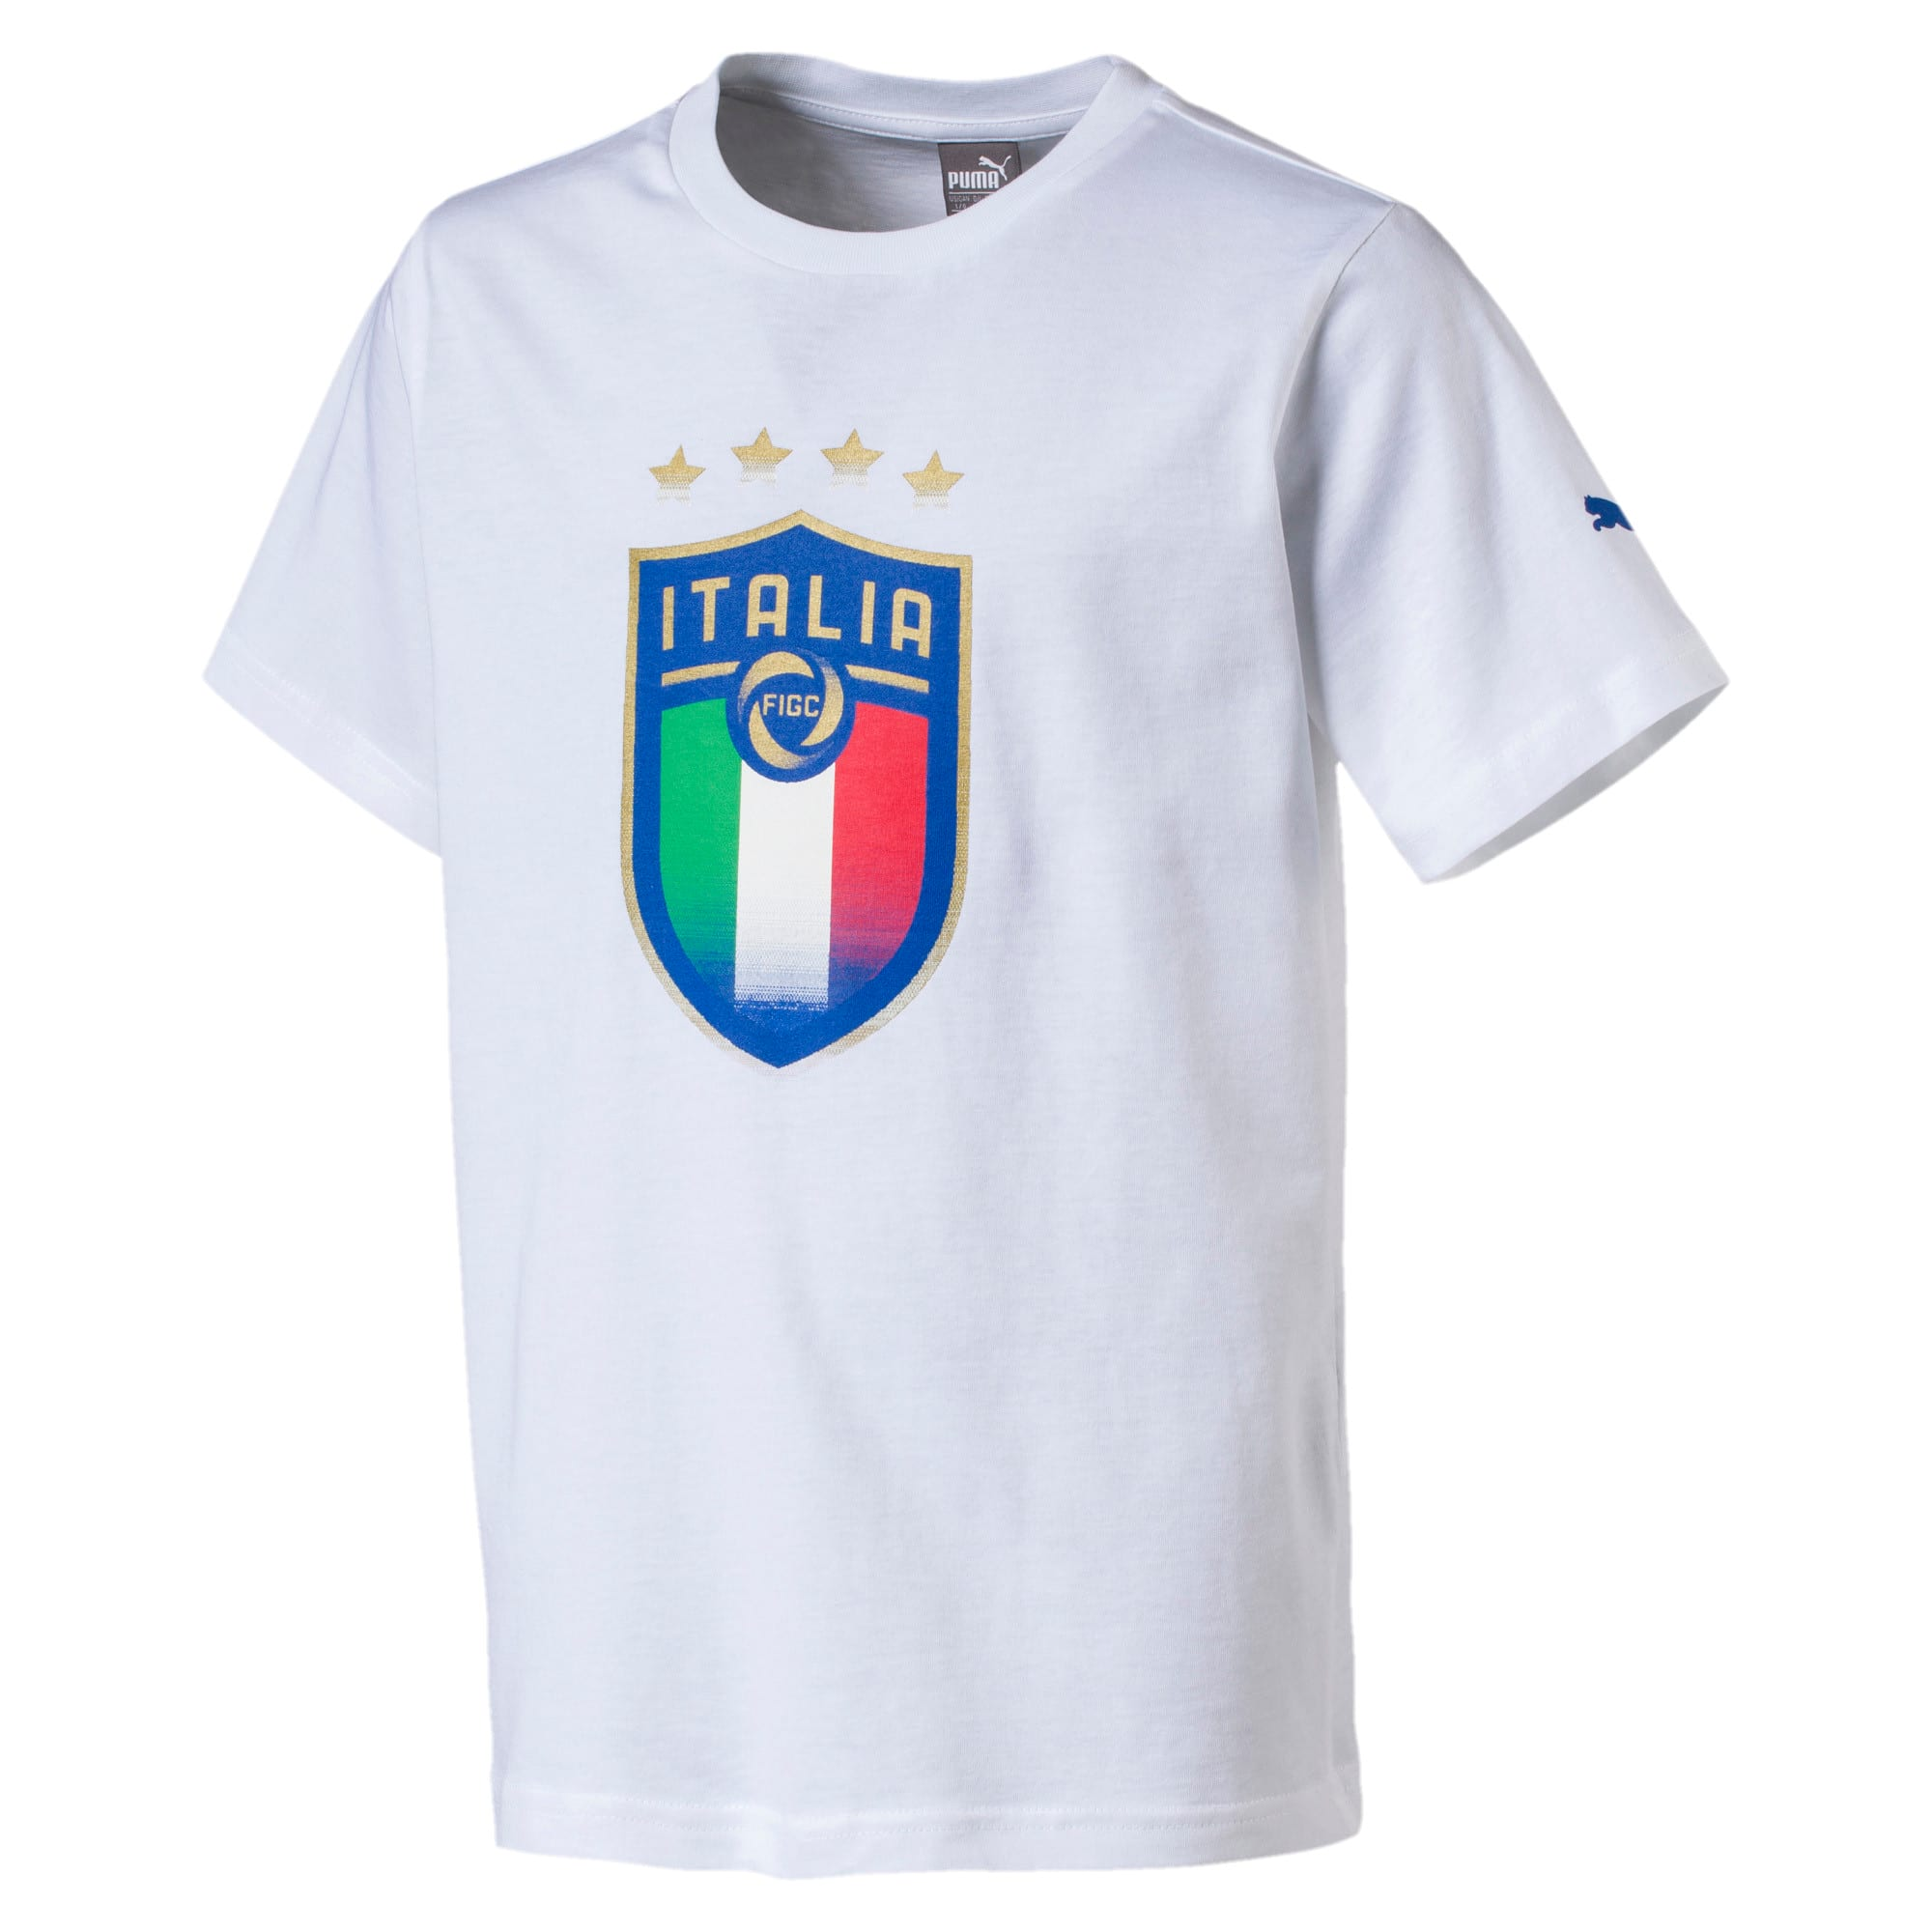 Thumbnail 1 of Italia Badge Tee Jr, Puma White, medium